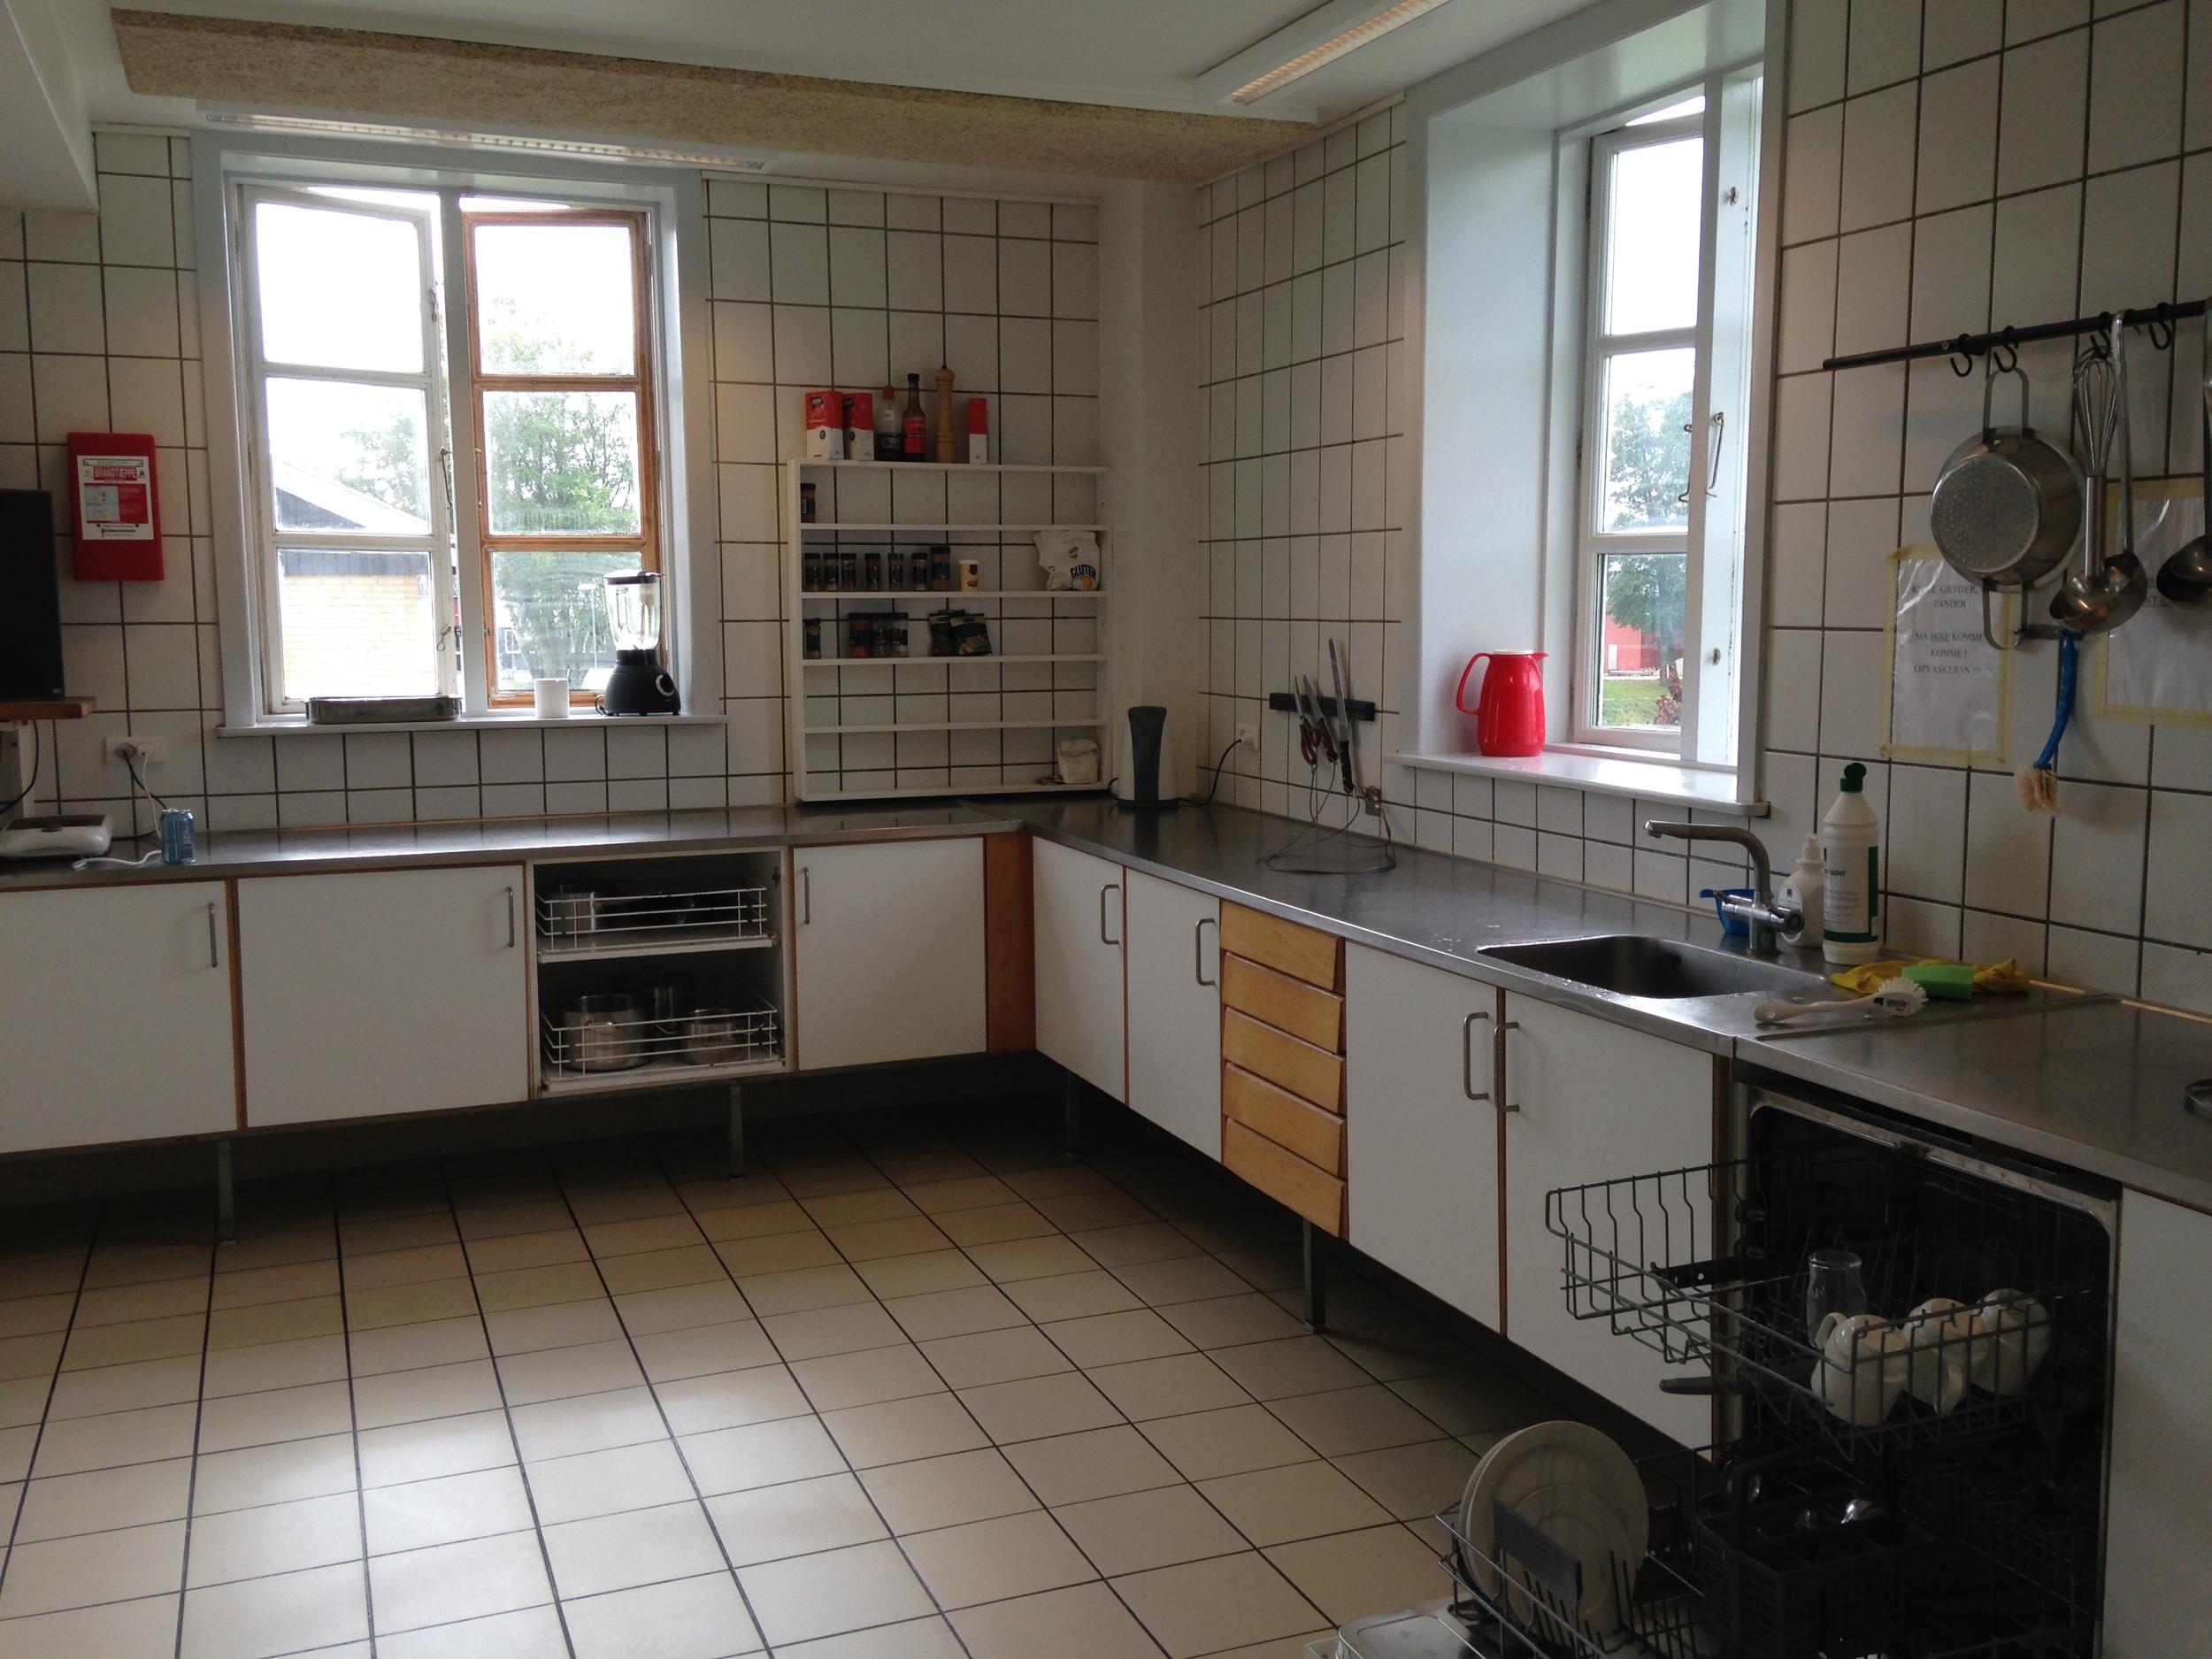 Kitchen, Danish Prison